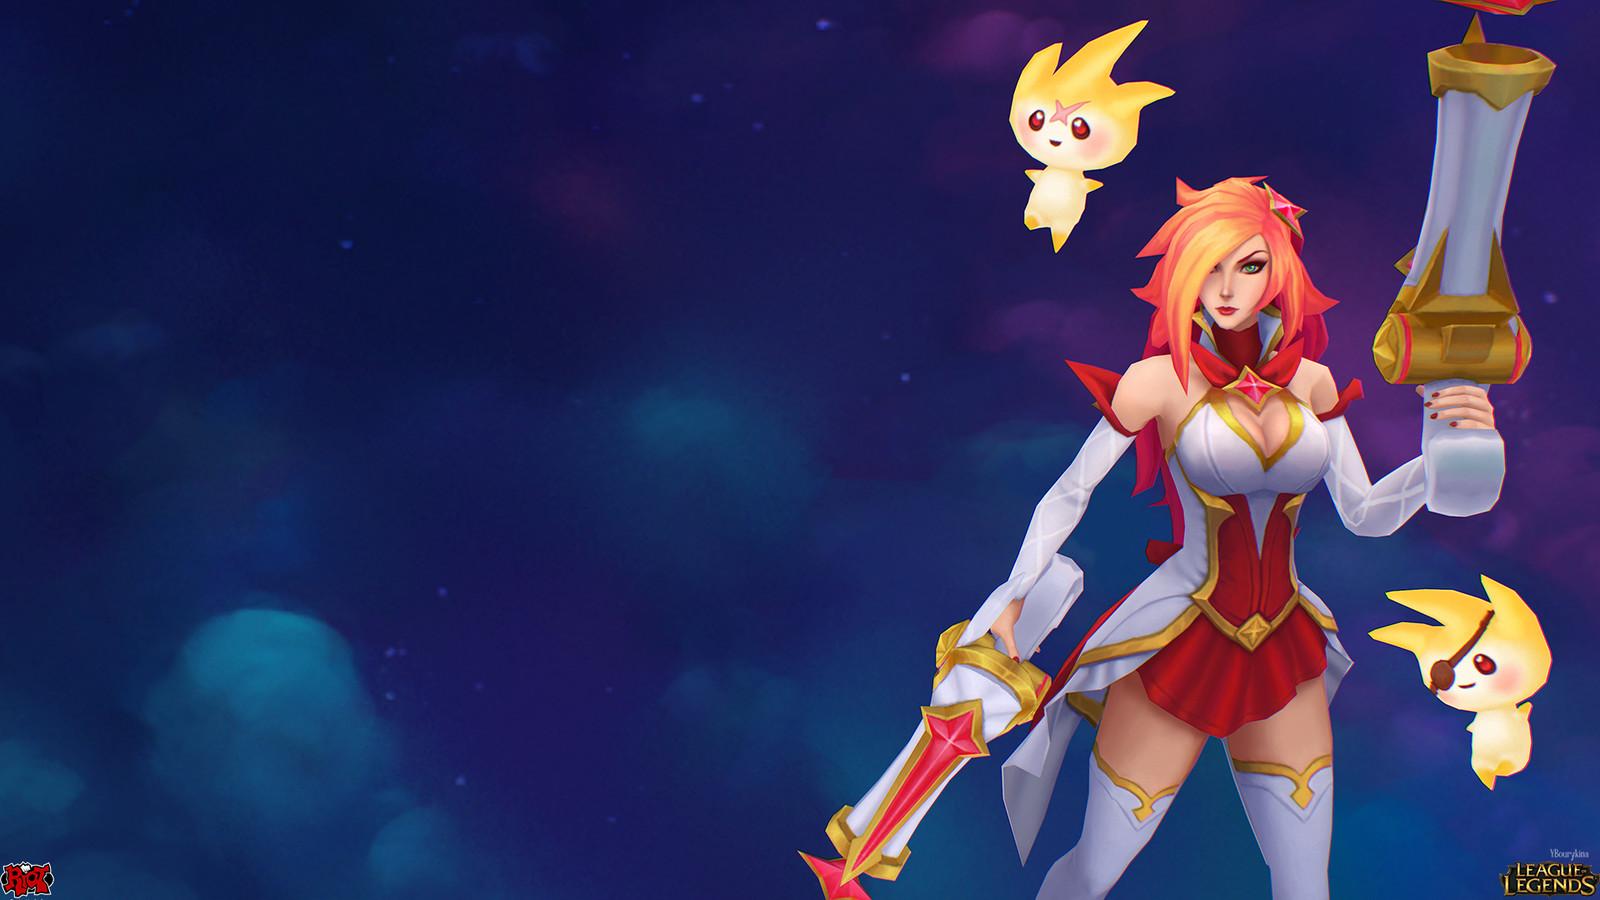 Star Guardian Miss Fortune - League of Legends skin - LoL Skin